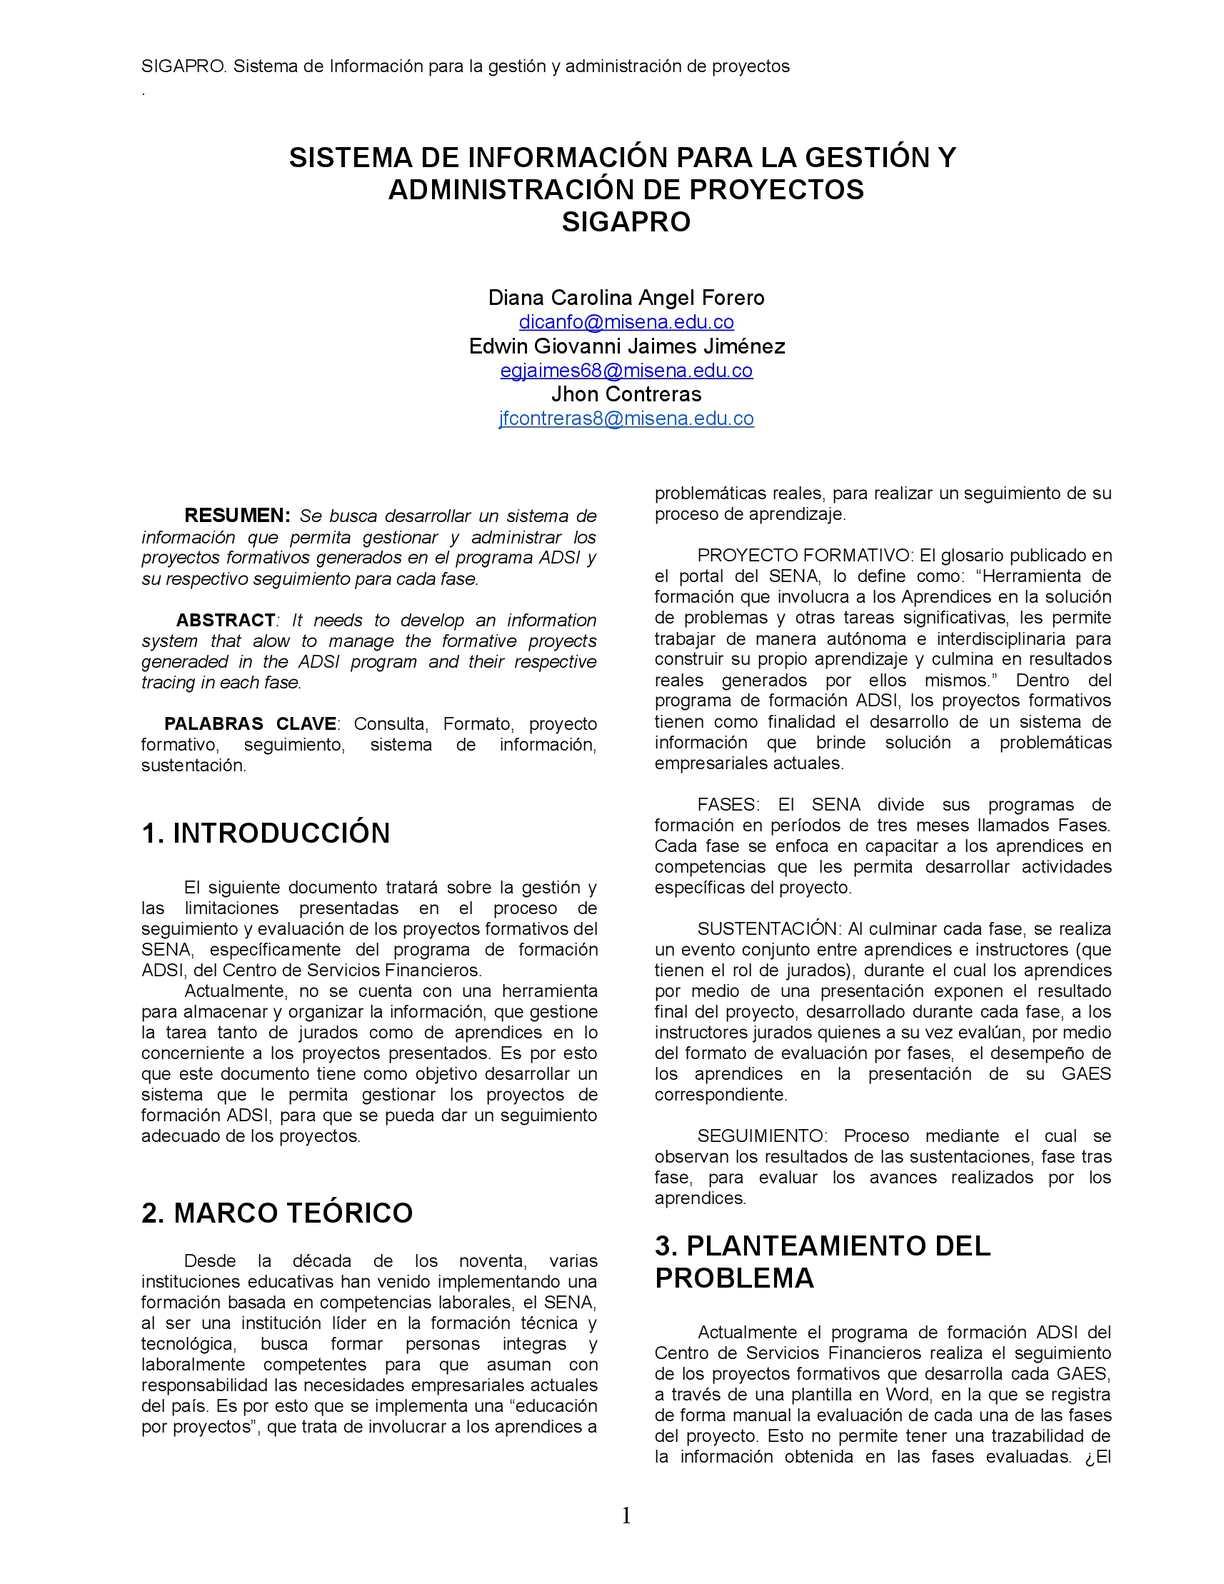 Calaméo - IEEE SIGAPRO